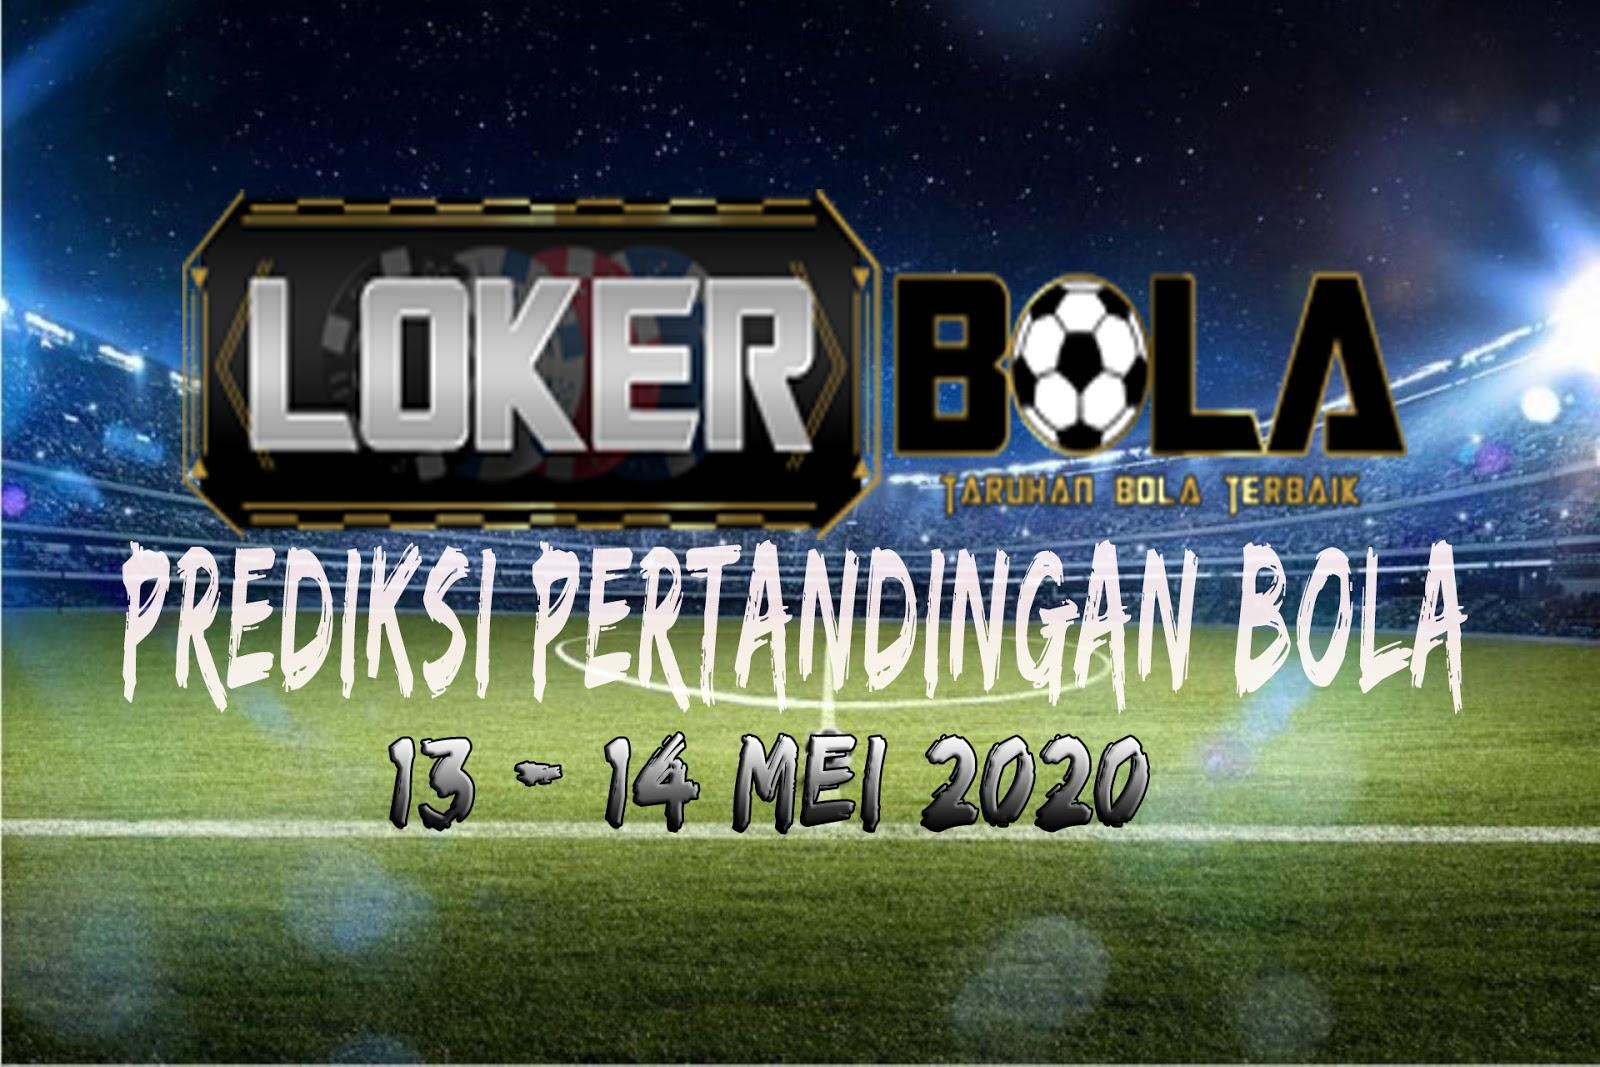 PREDIKSI PERTANDINGAN BOLA 13 – 14 May 2020